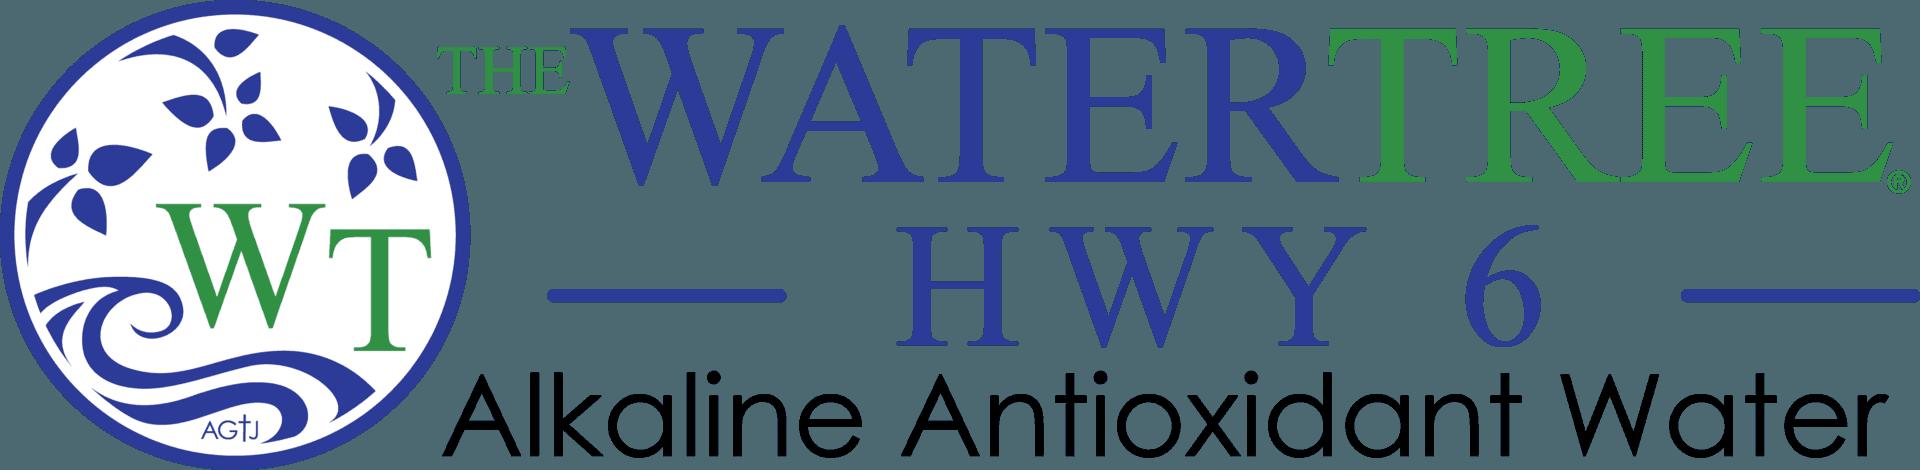 Water Tree Hwy 6 - Logo